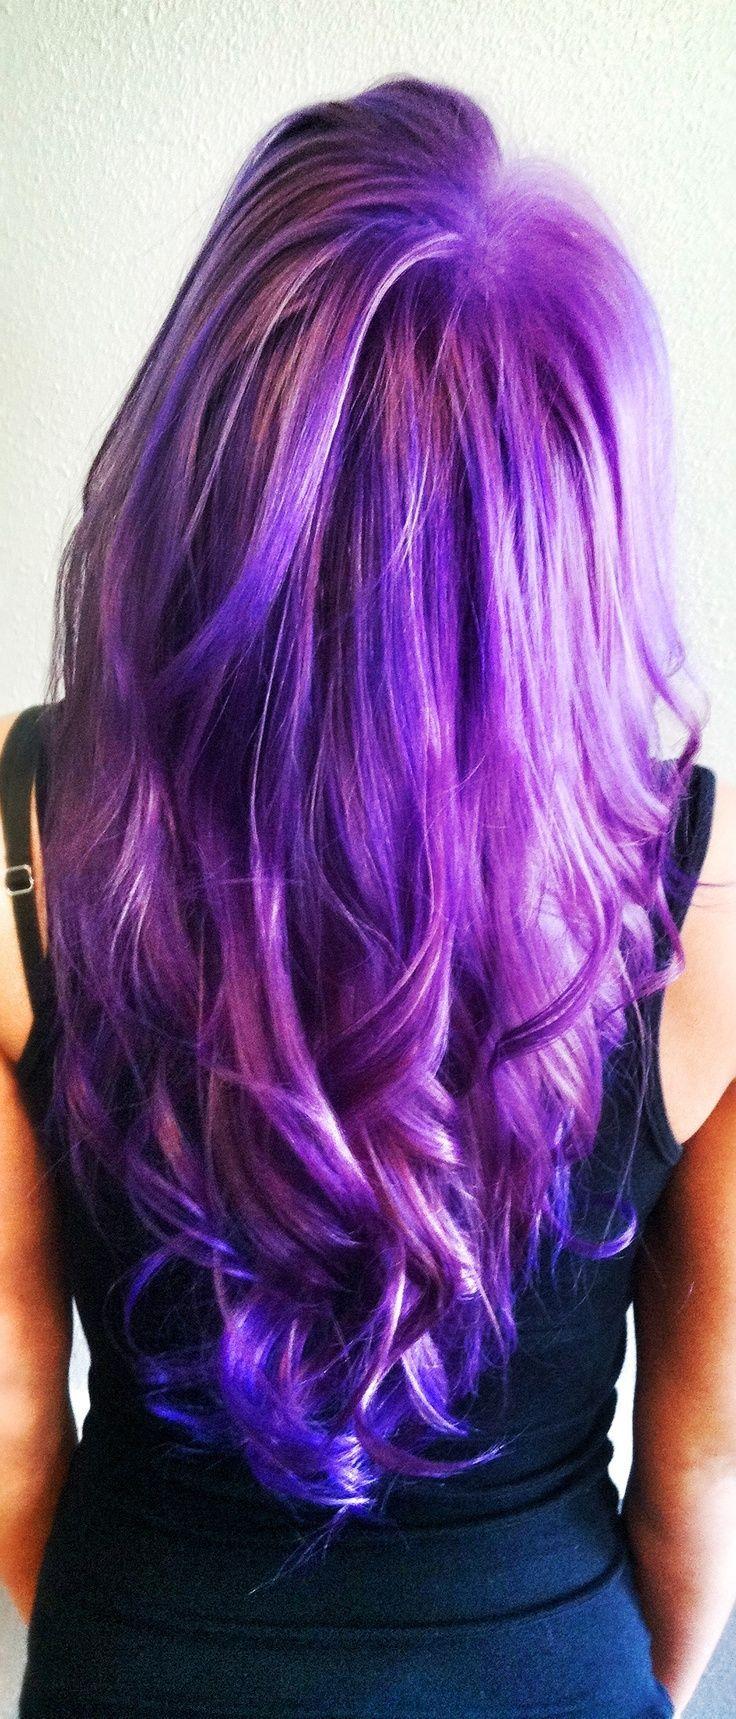 violette sachen